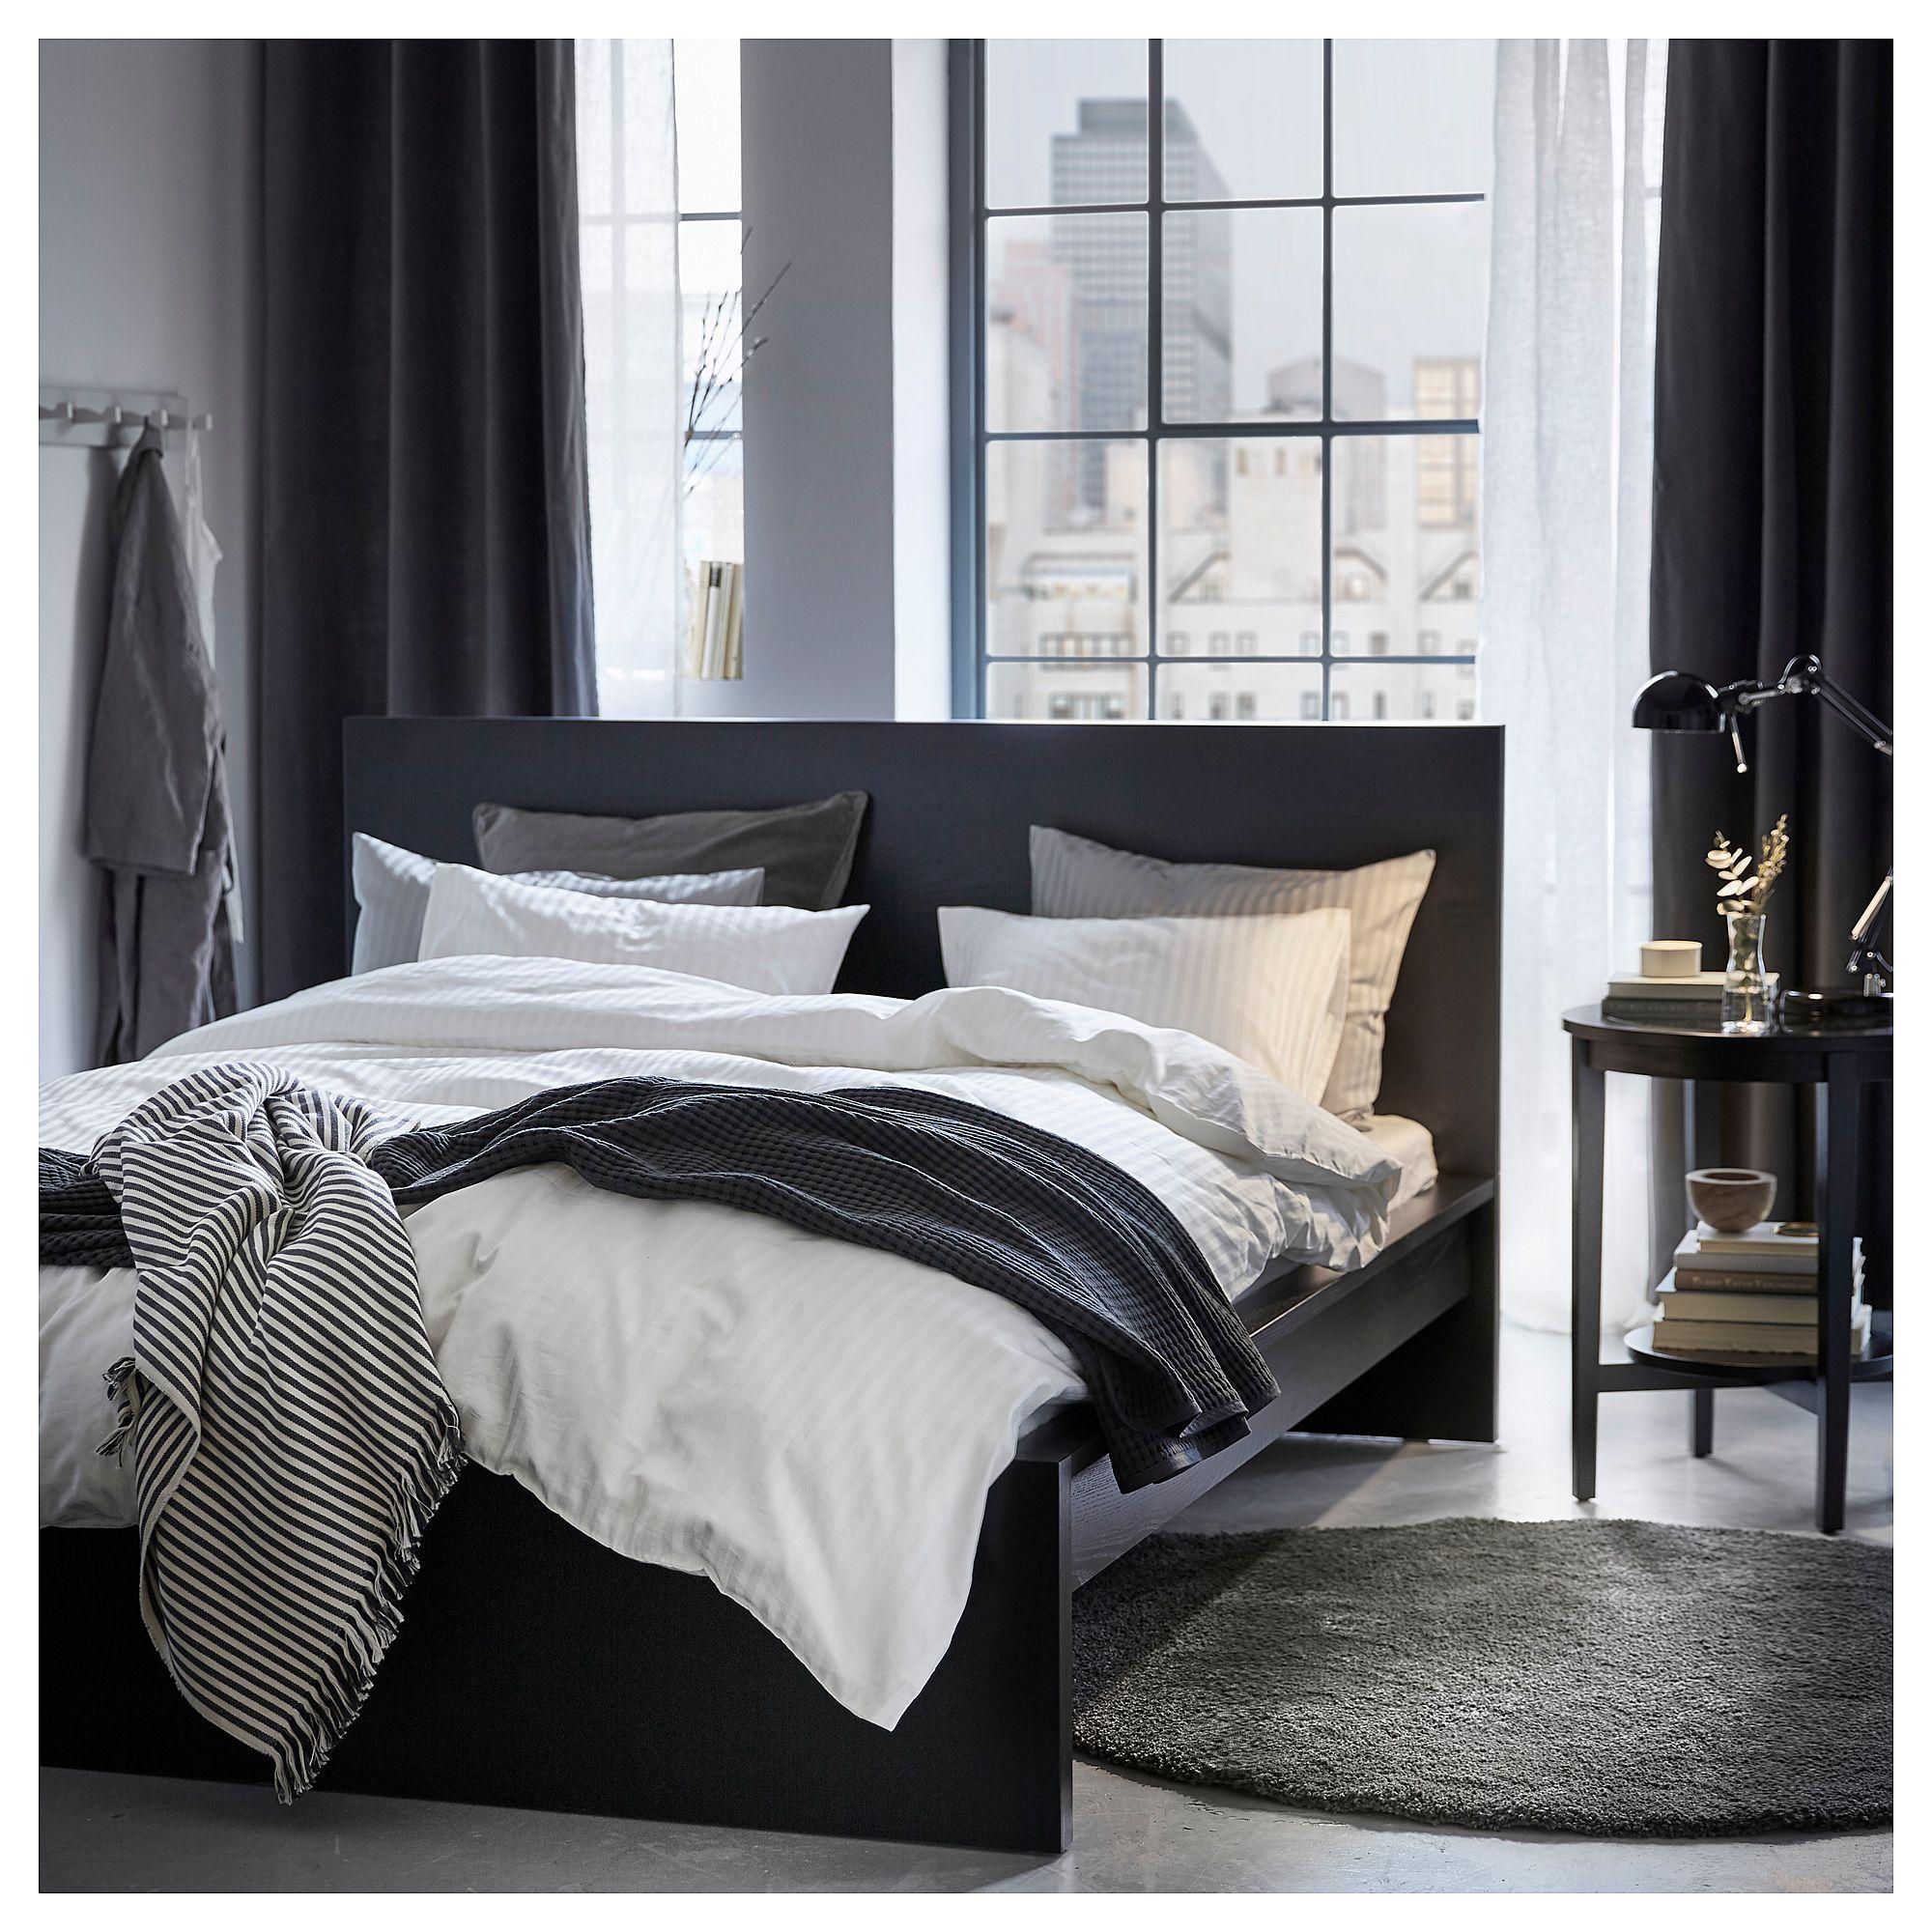 IKEA NATTJASMIN Duvet cover and pillowcase(s) white in